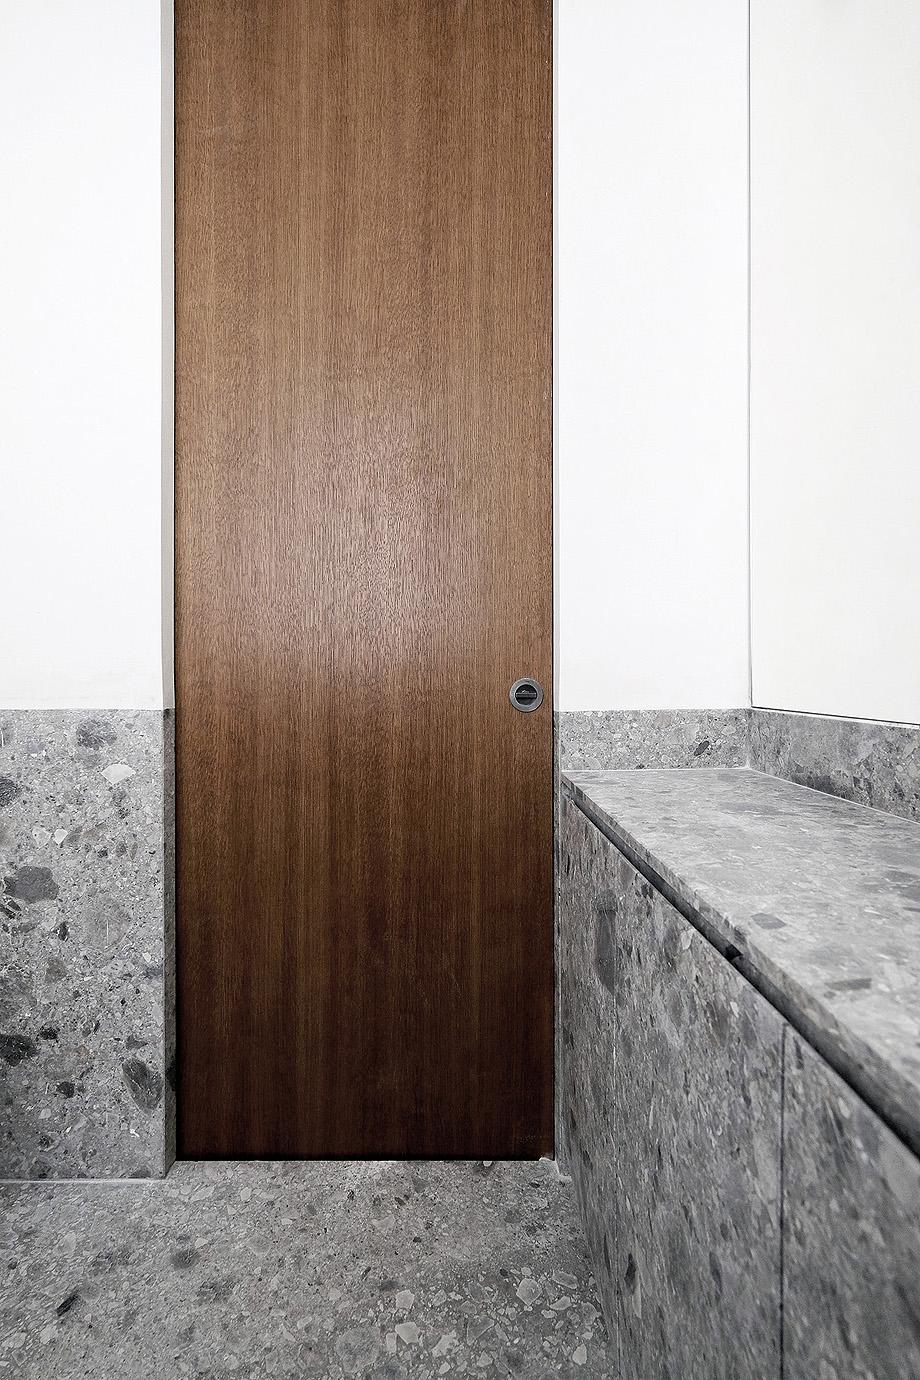 apartamento p-420 de nicolas dorval-bory - foto nicolas dorval-bory (13)